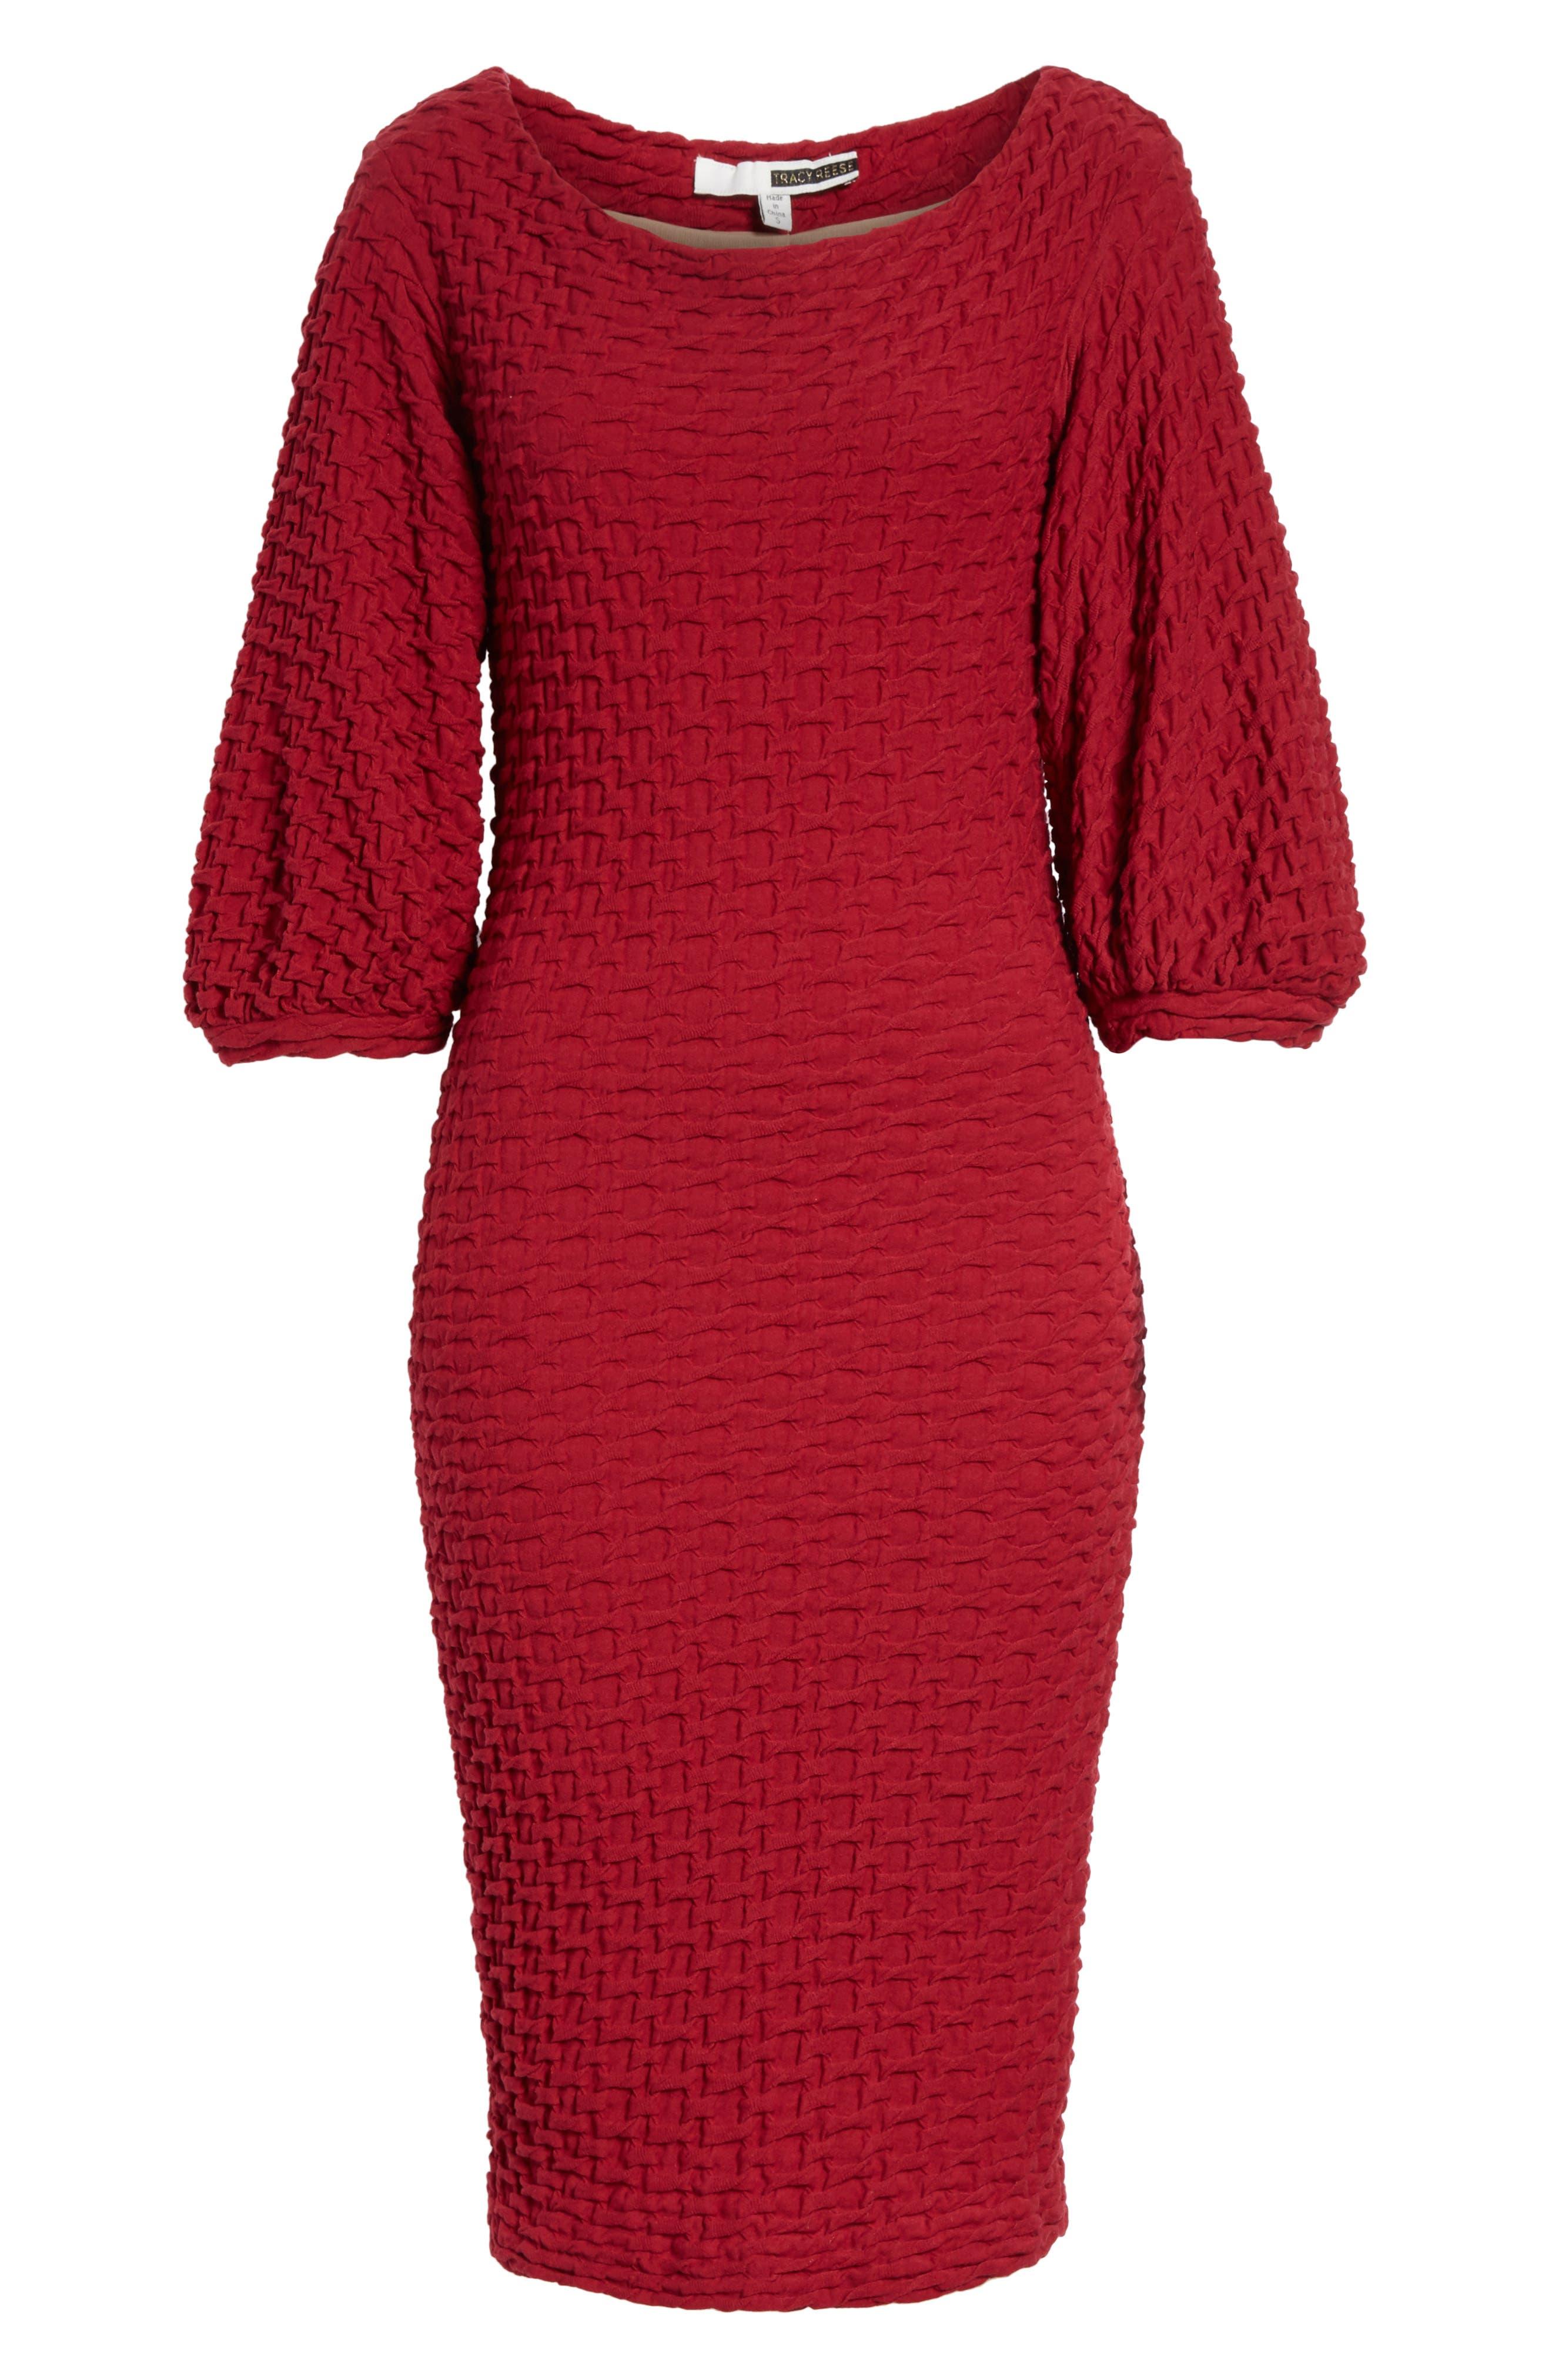 Basket Weave Balloon Sleeve Dress,                             Alternate thumbnail 6, color,                             643